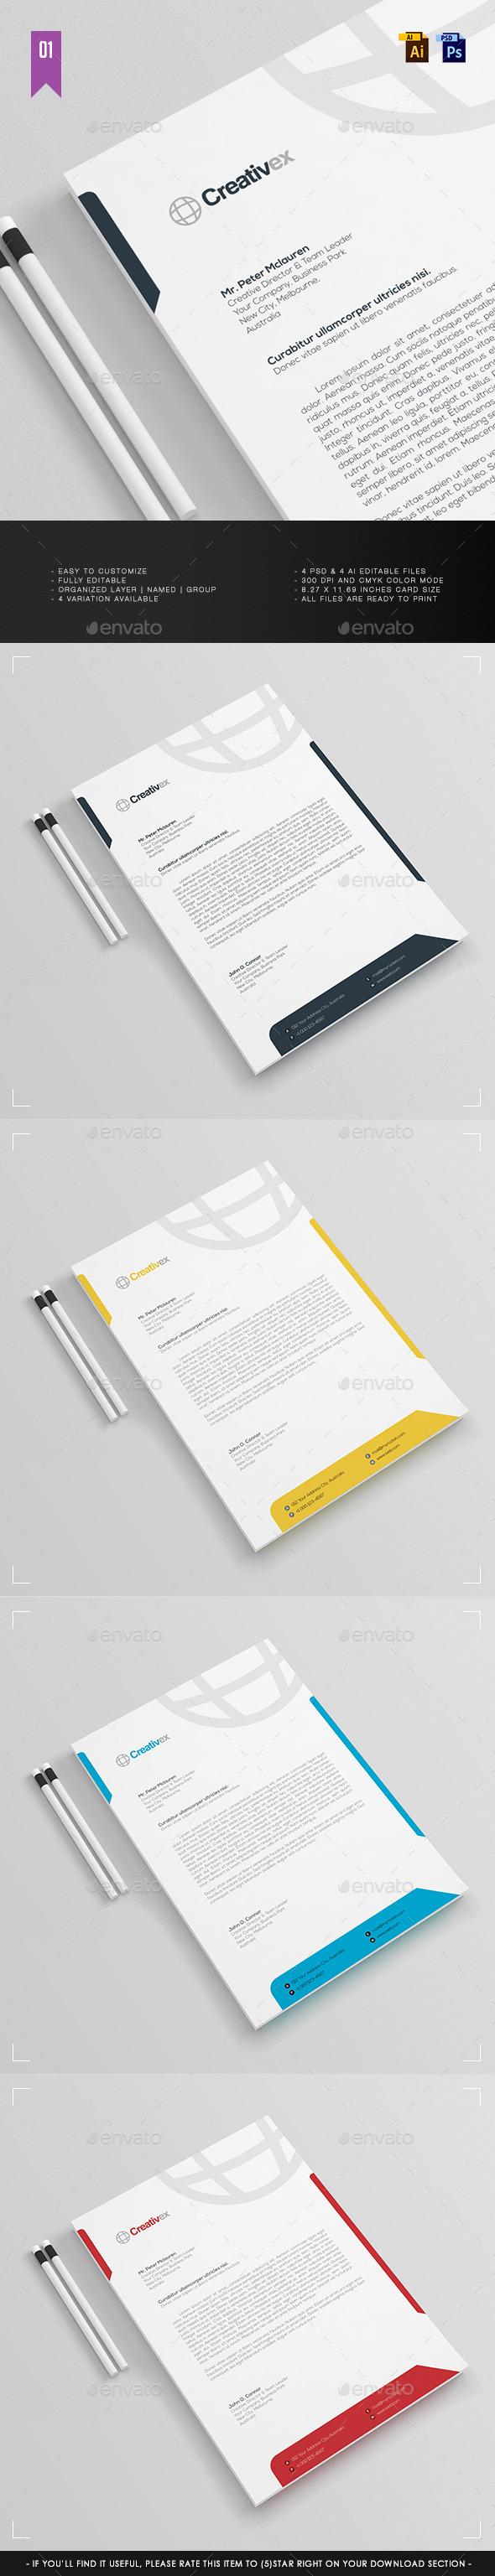 GraphicRiver A4 Business Letterhead V.001 11816798